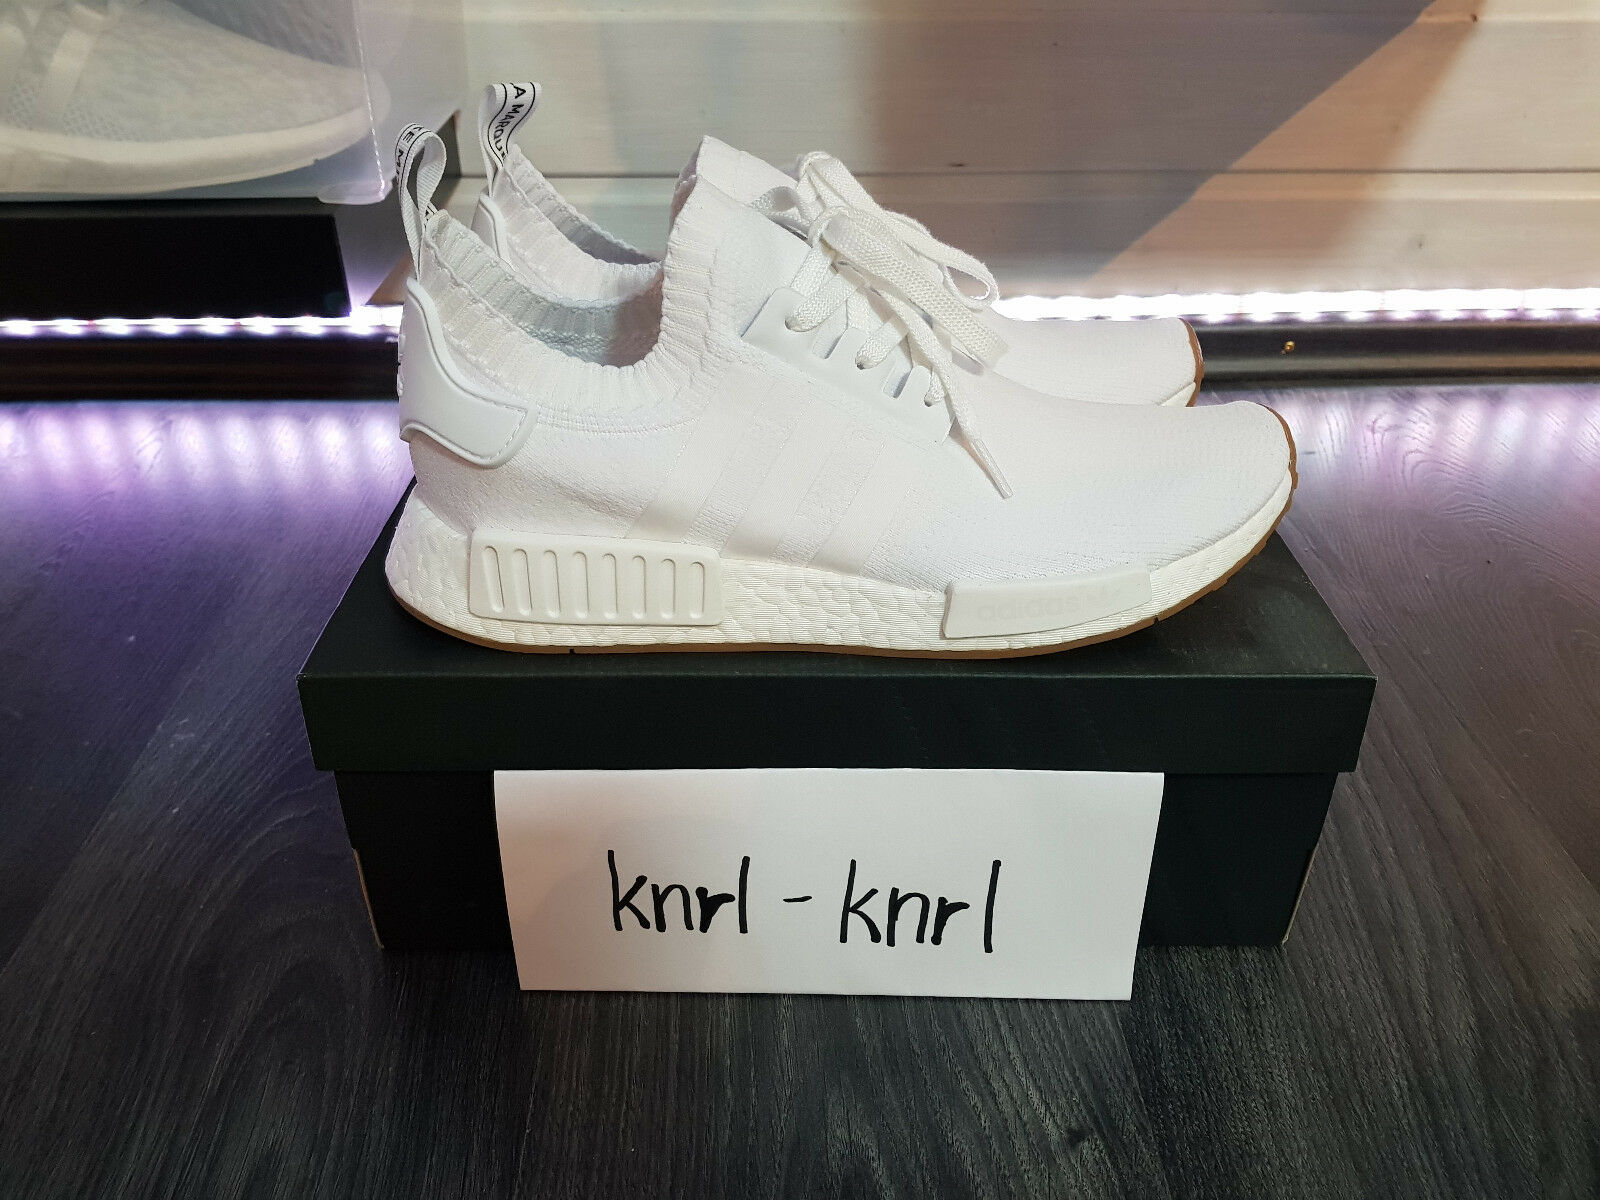 Adidas tamaño: Originals nmd_r1 PK calcetines cortos tamaño: Adidas 44 2/3 Gum Pack 07e23f